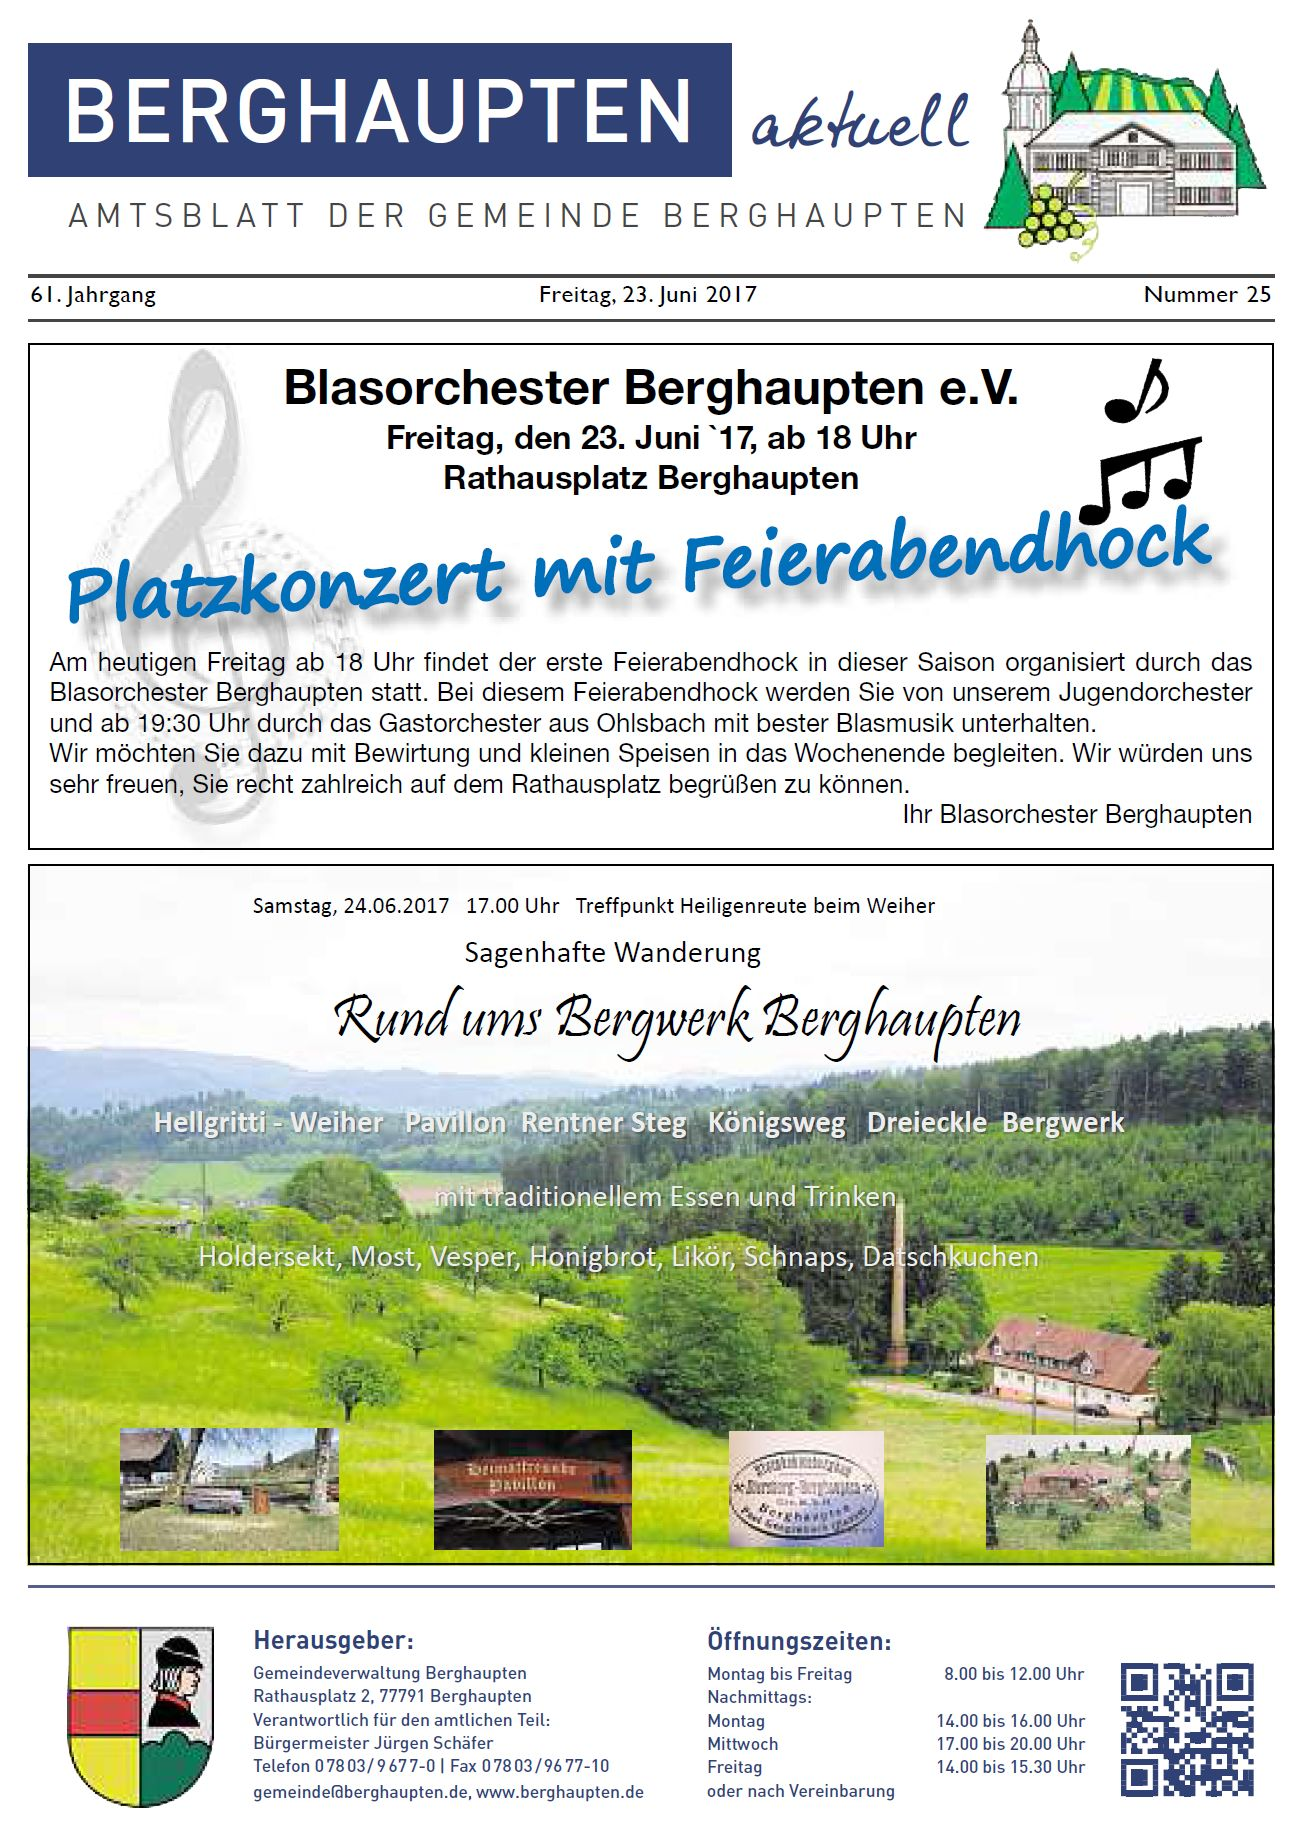 Amtsblatt 2017 KW 25